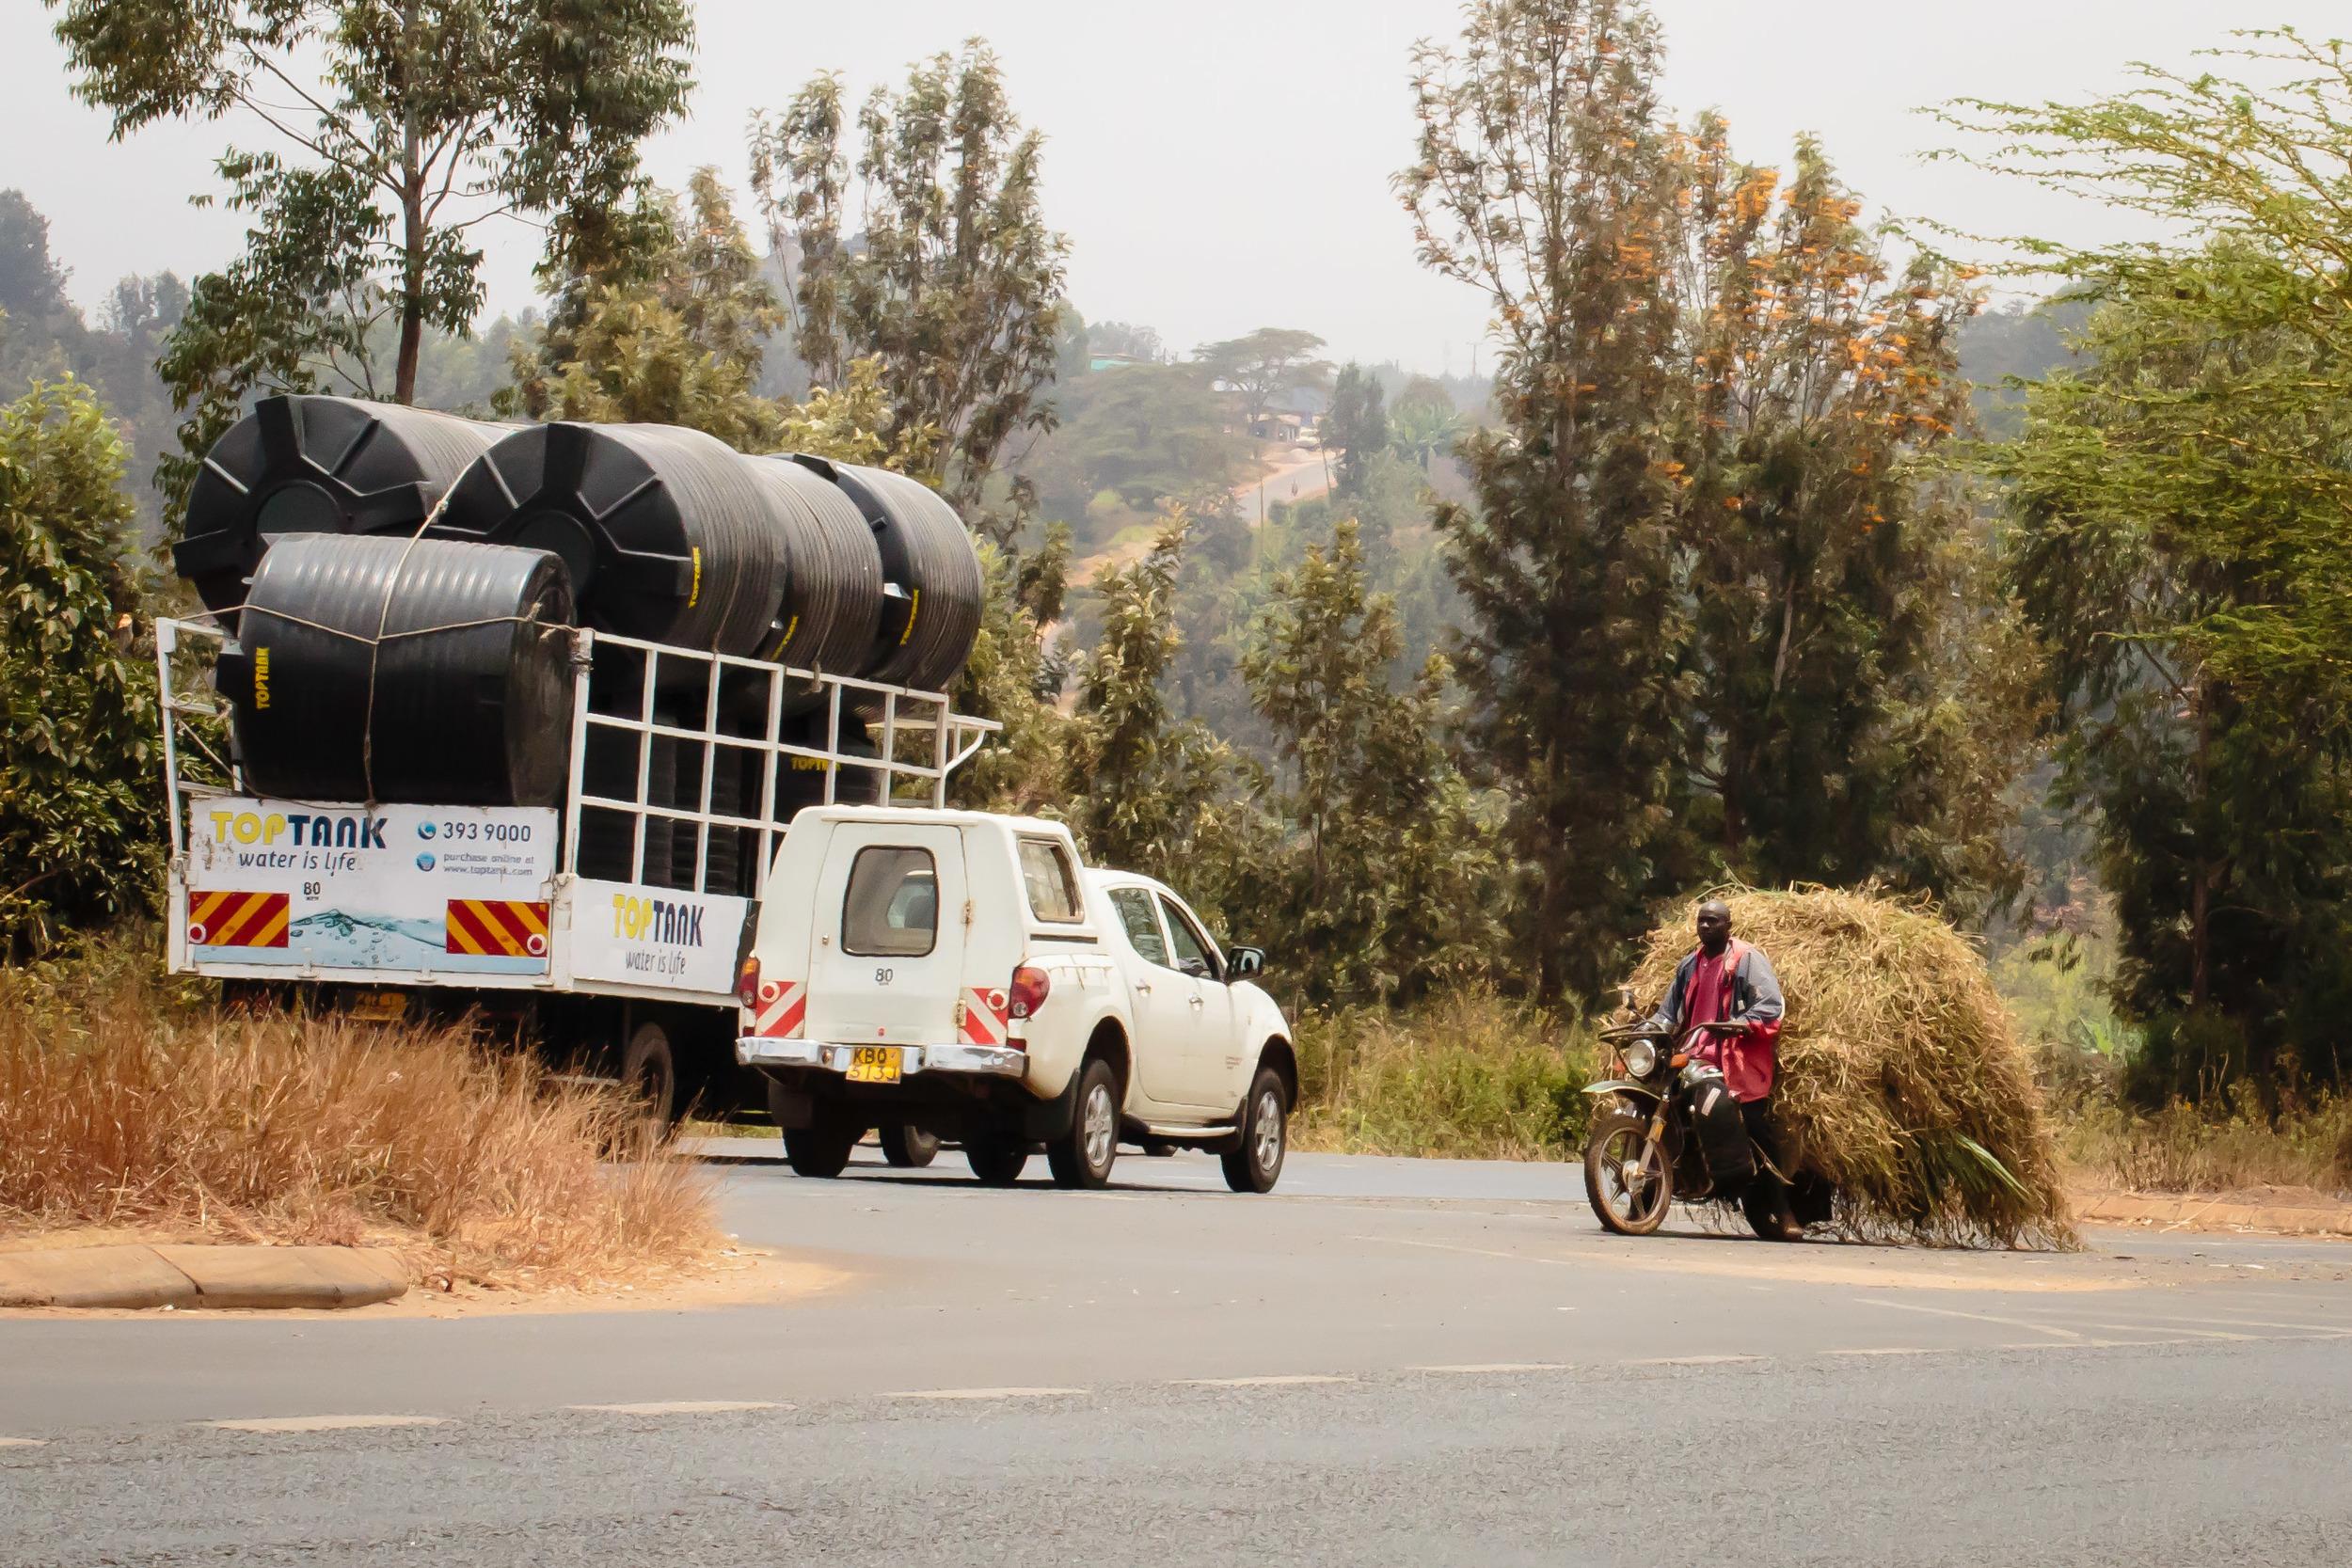 Motorcycle Commerce, On the Road to Nairobi, Kenya